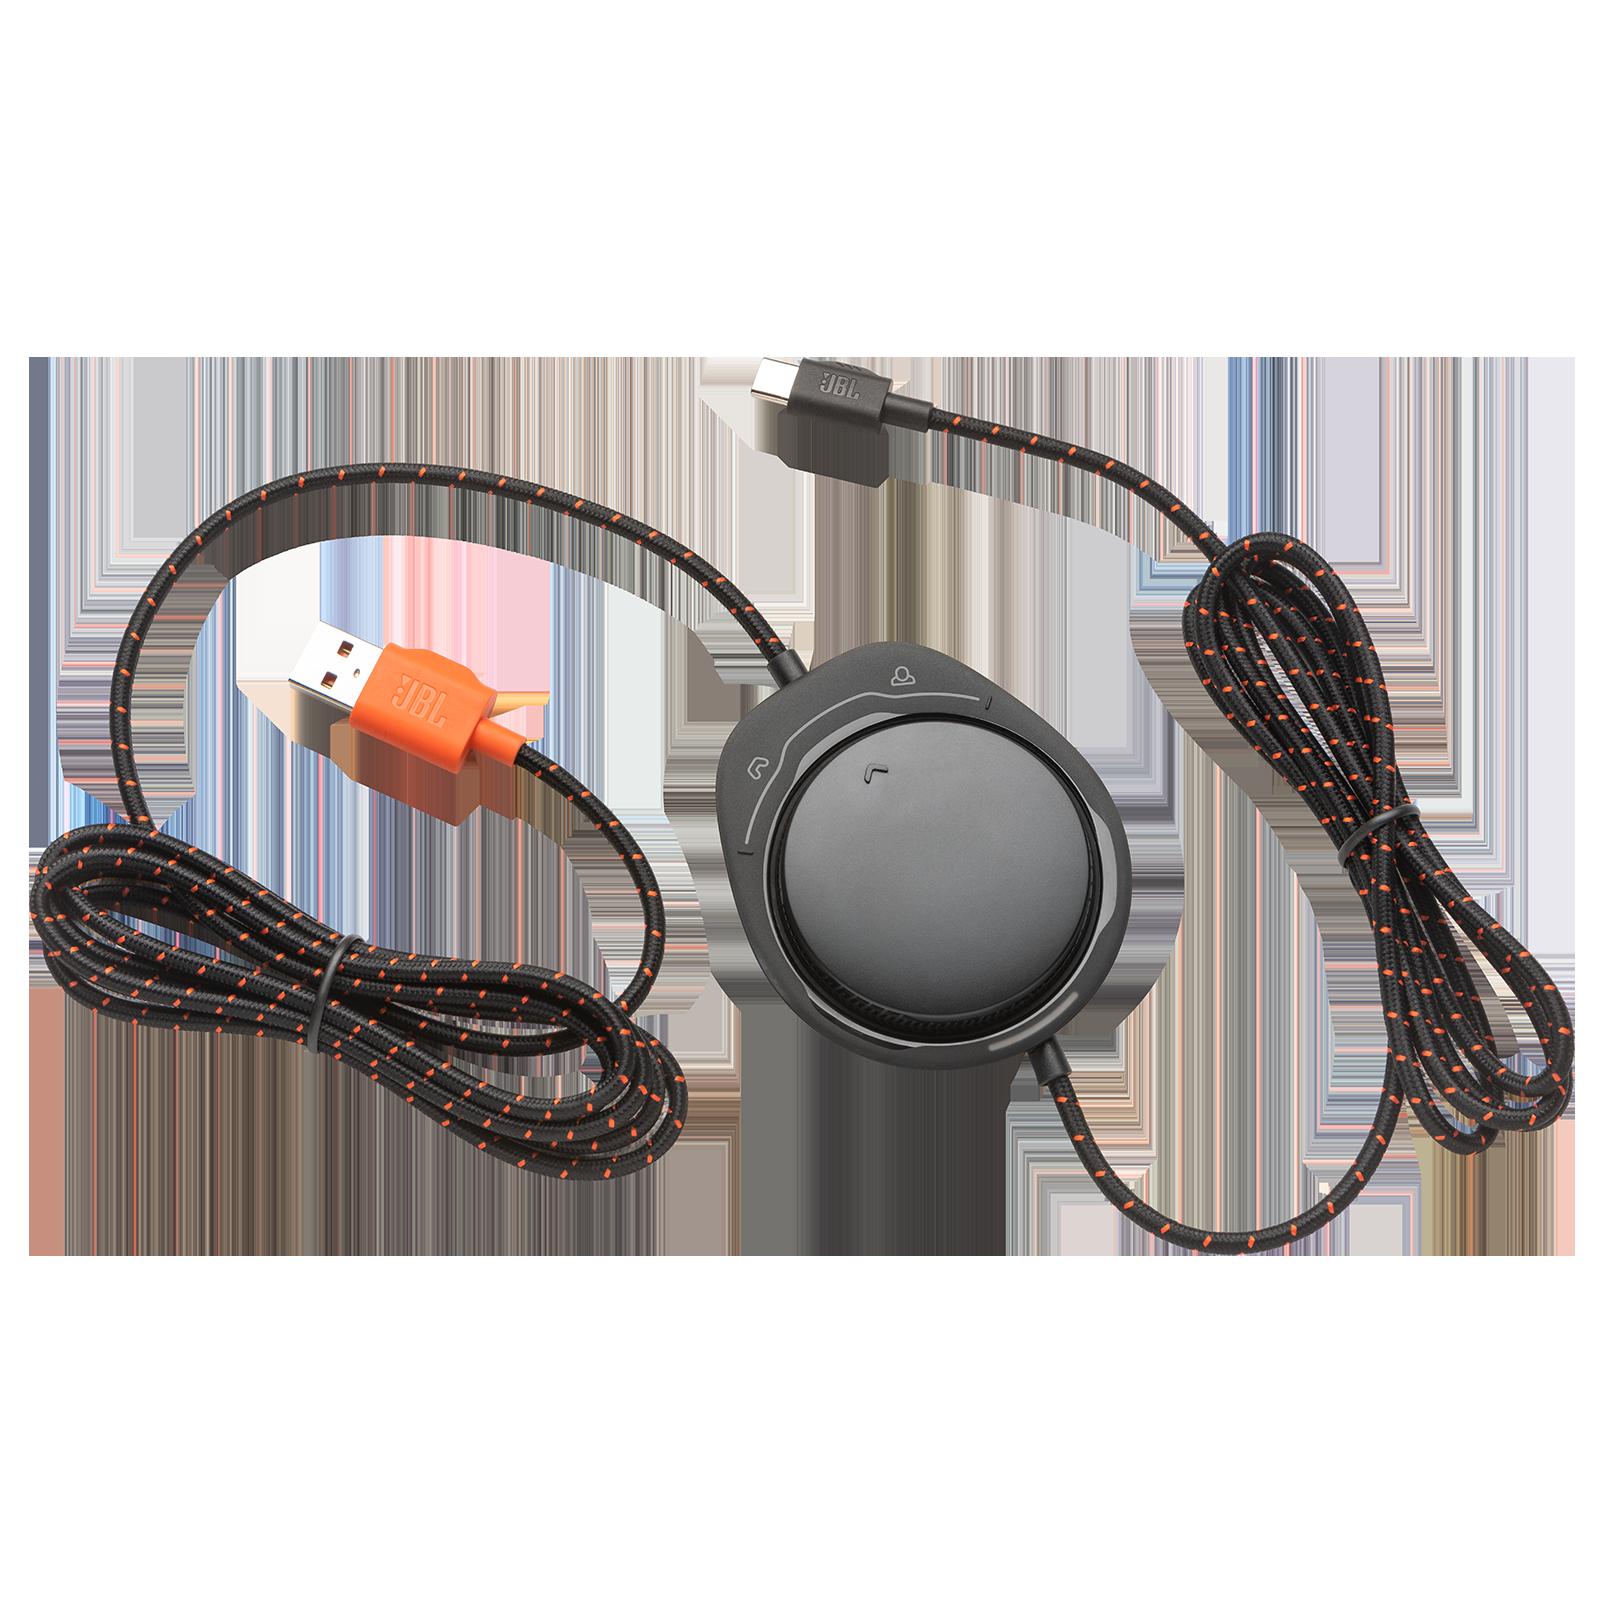 JBL USB controller for Quantum ONE - Black - USB controller - Hero